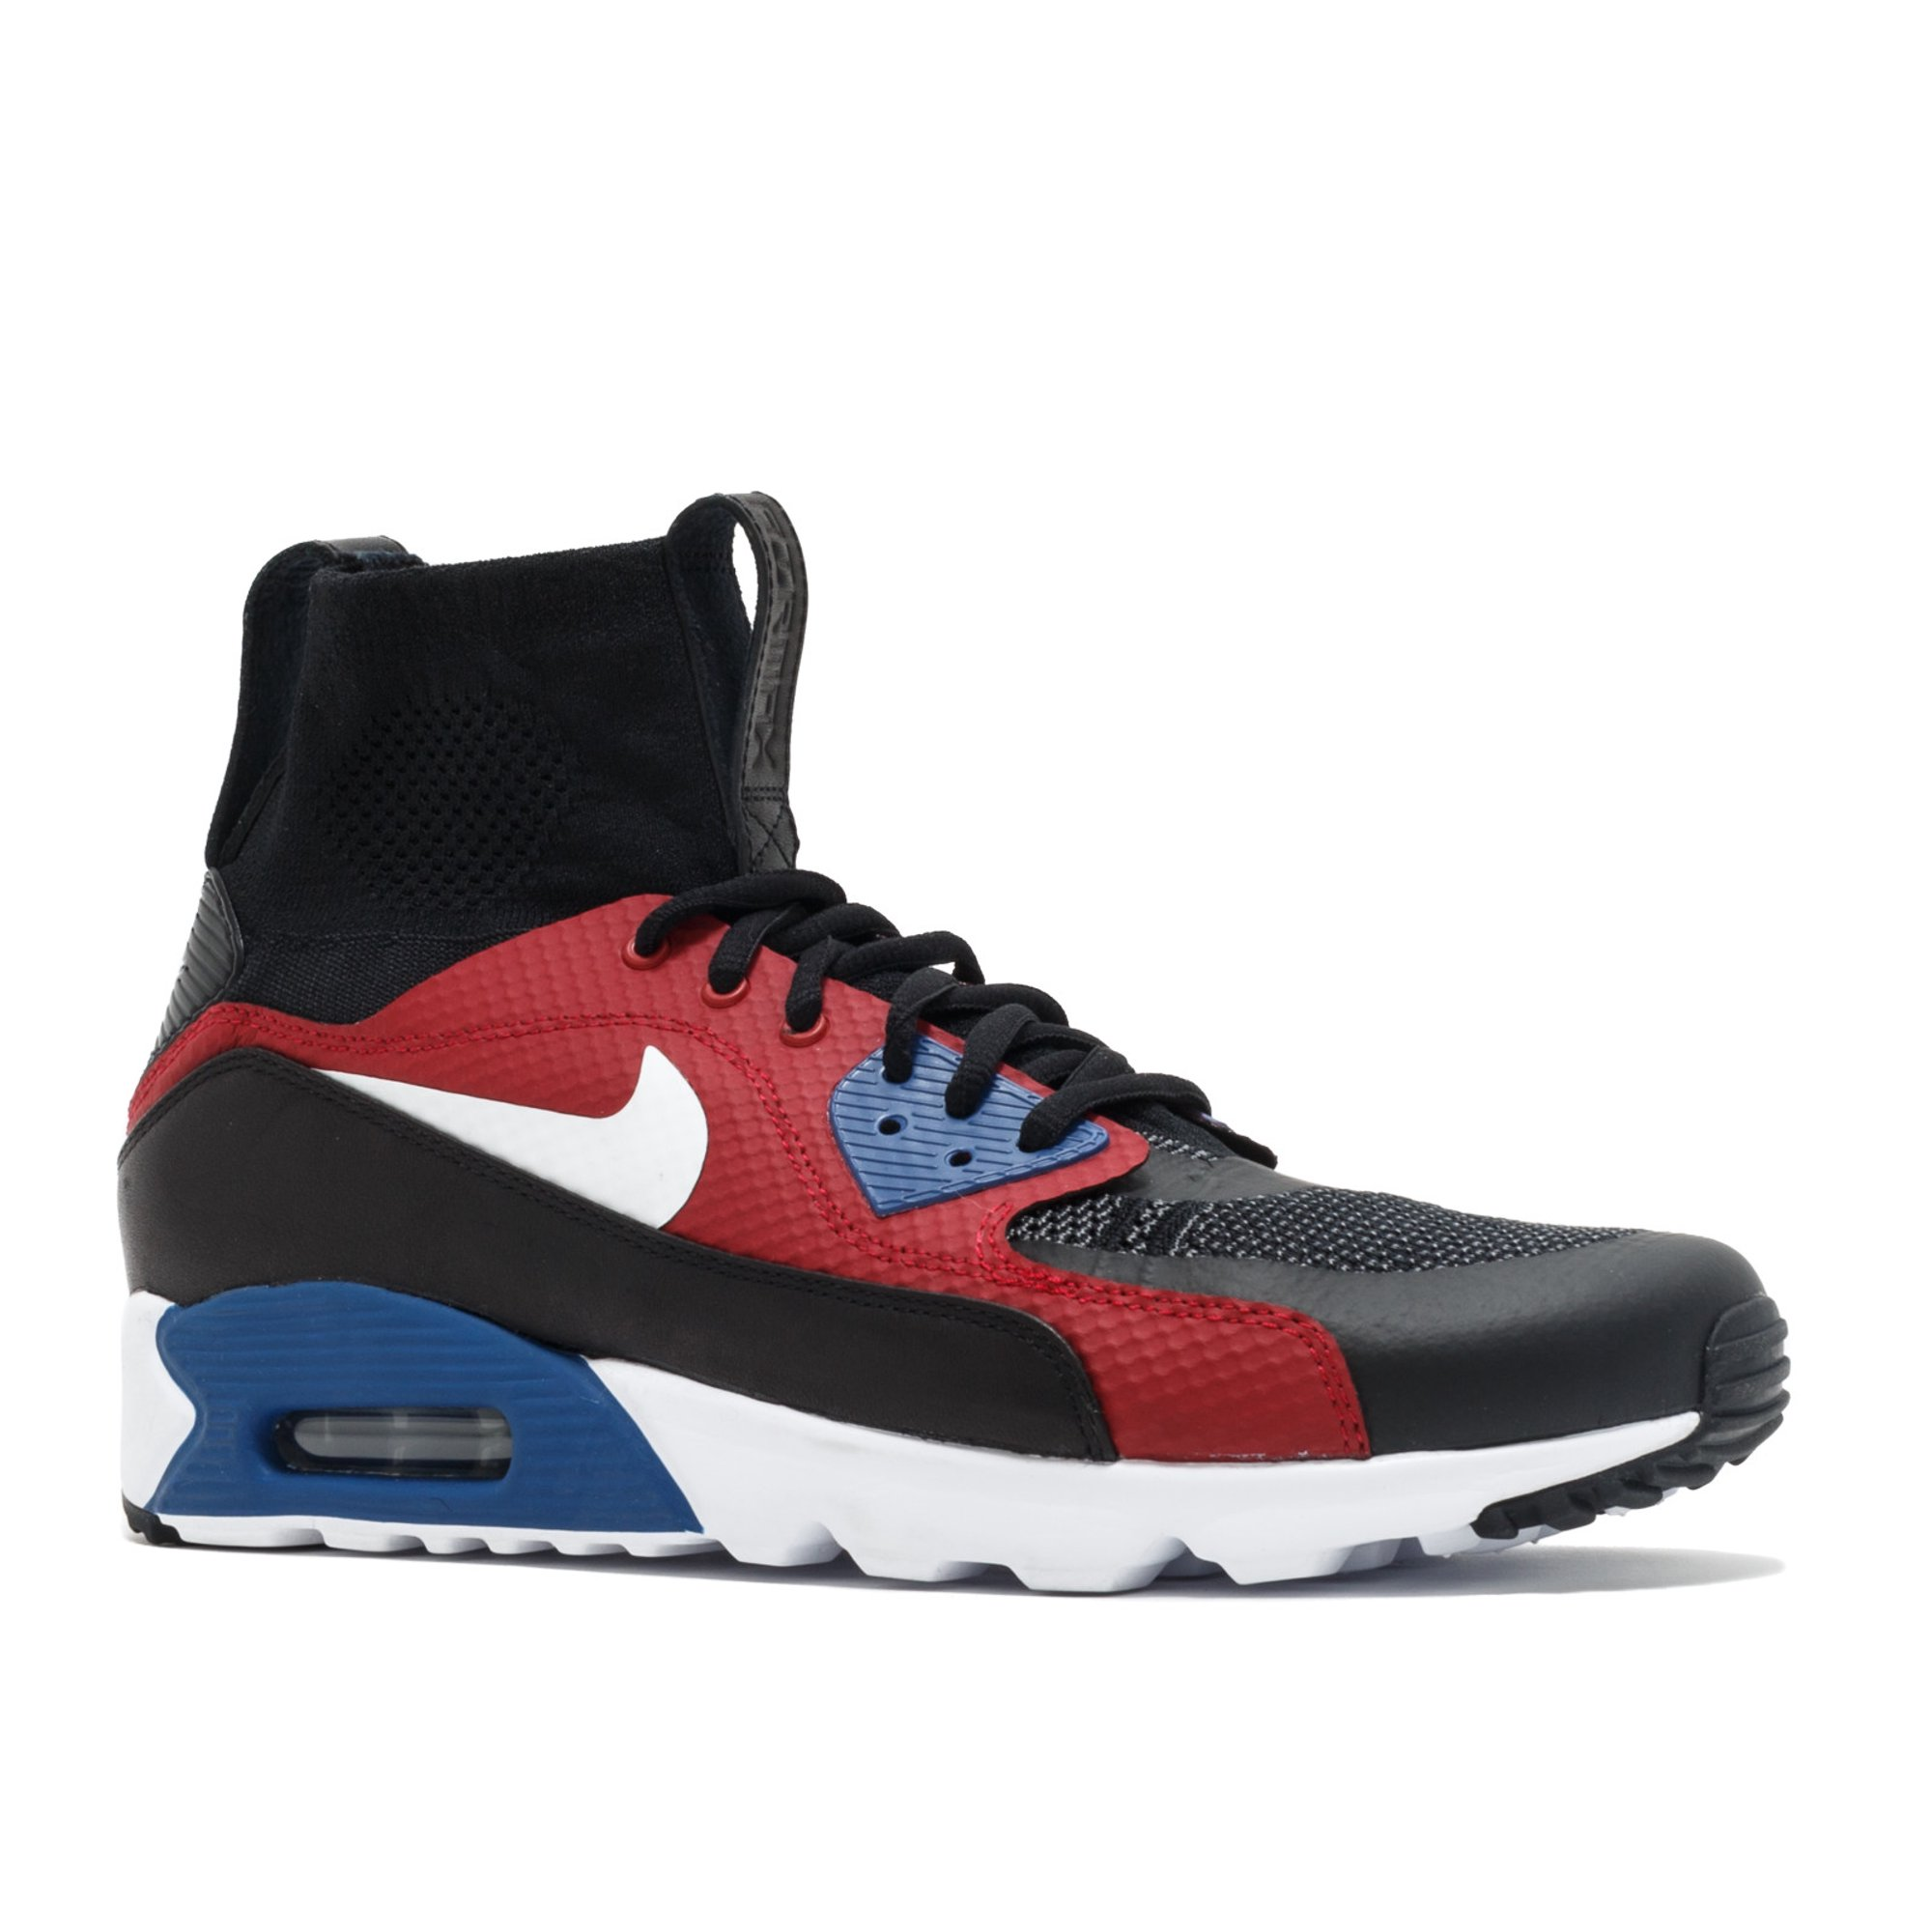 buy popular 0c778 1cd23 Nike - Men - Nike Air Max 90 Ultra Superfly  Tinker Hatfield  - 850613-001  - Size 8   Walmart Canada